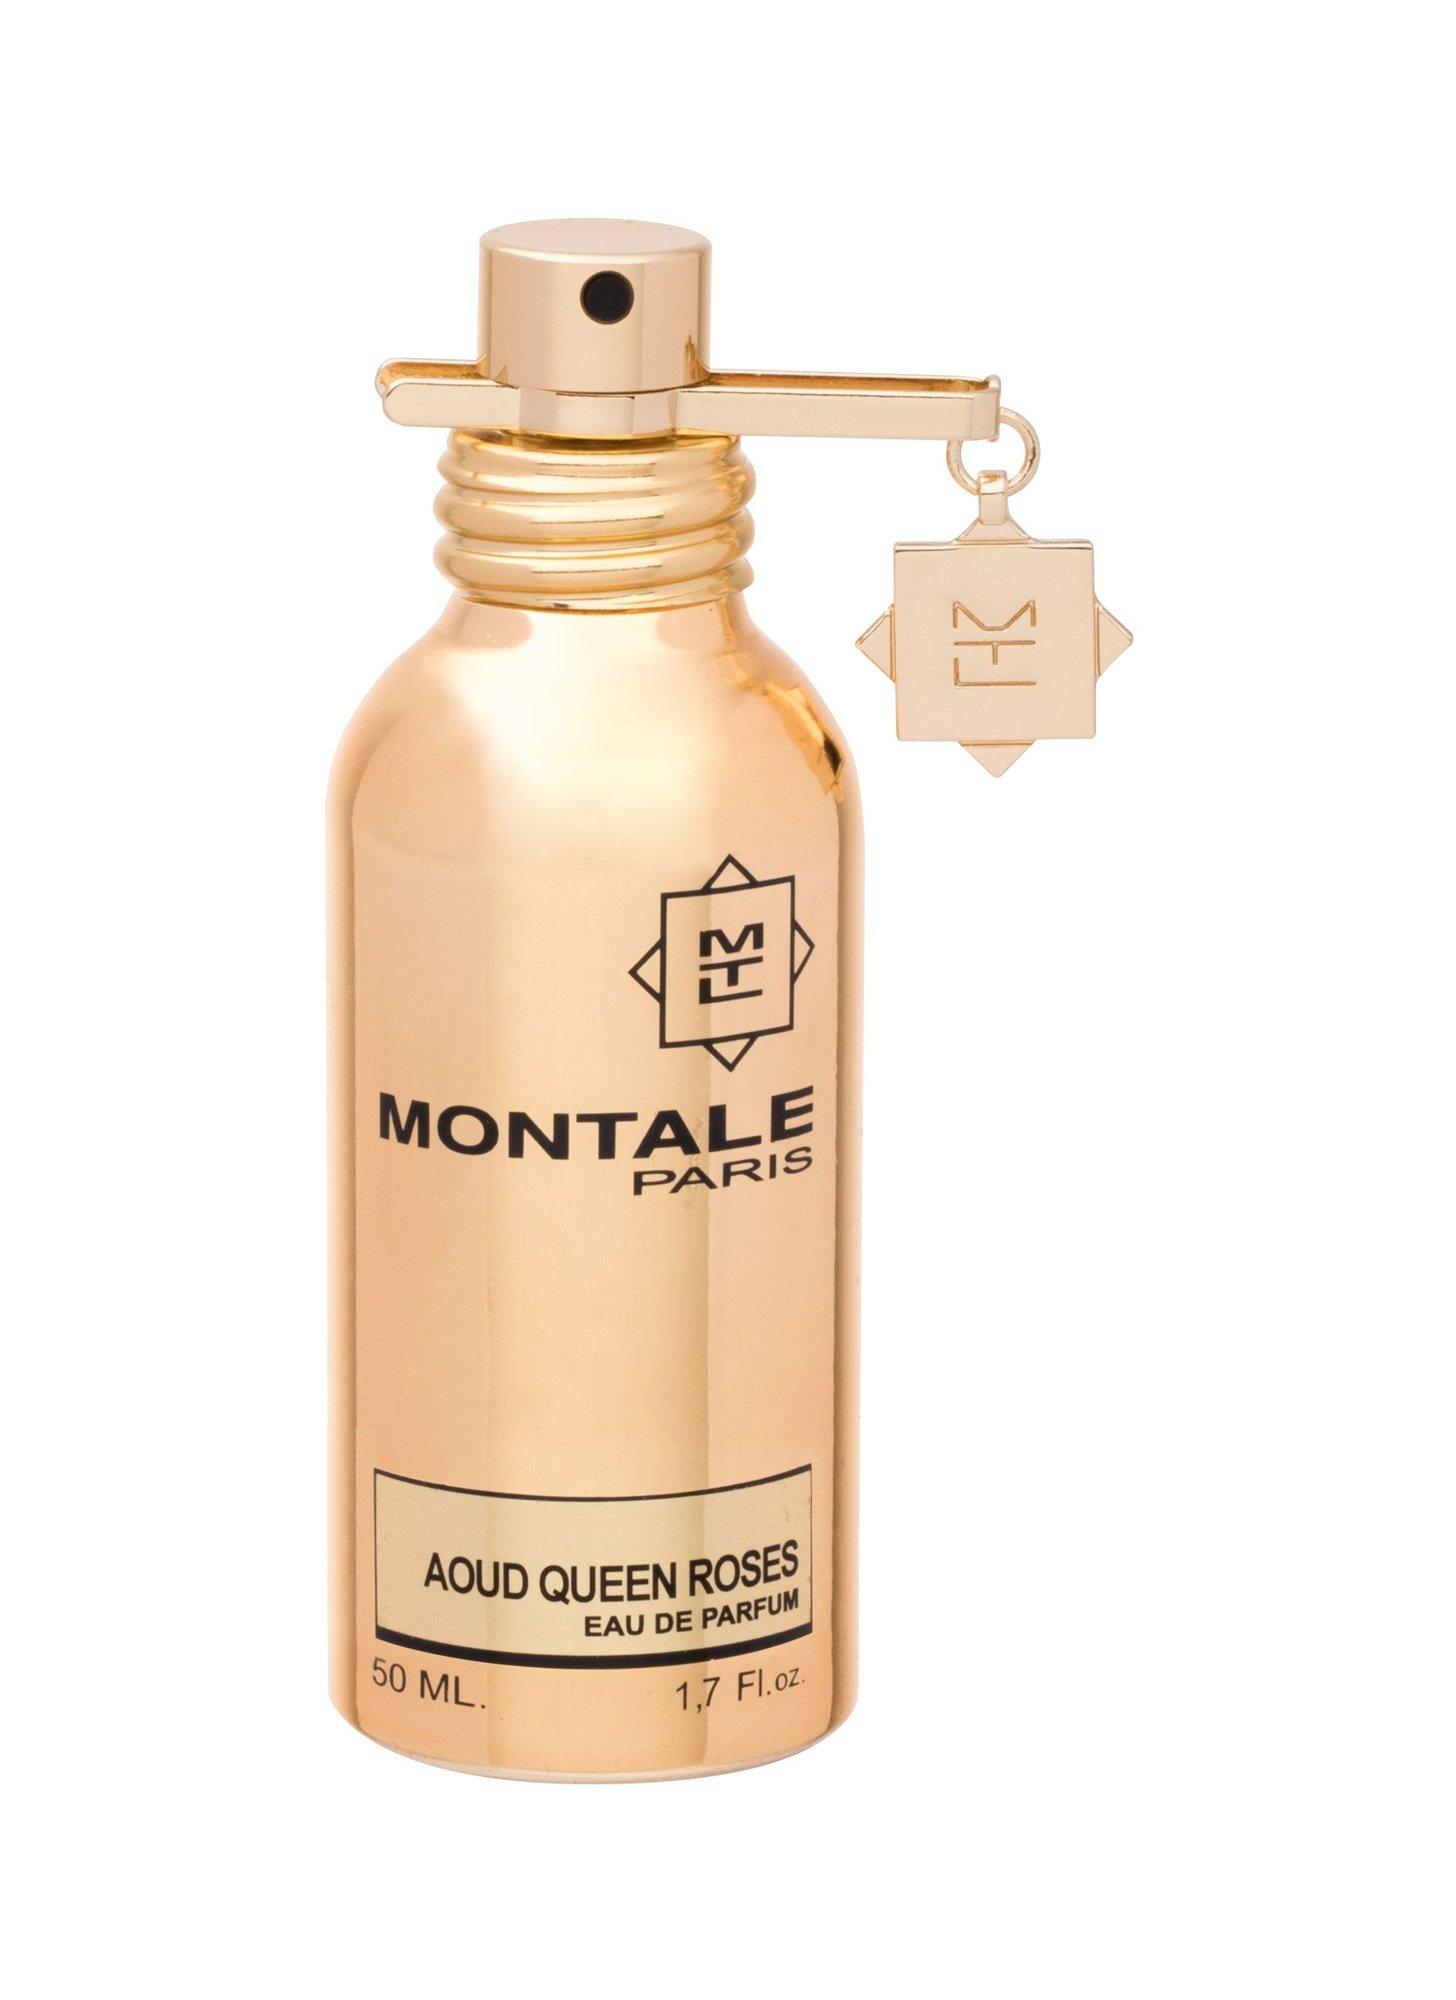 Montale Paris Aoud Queen Roses EDP 50ml